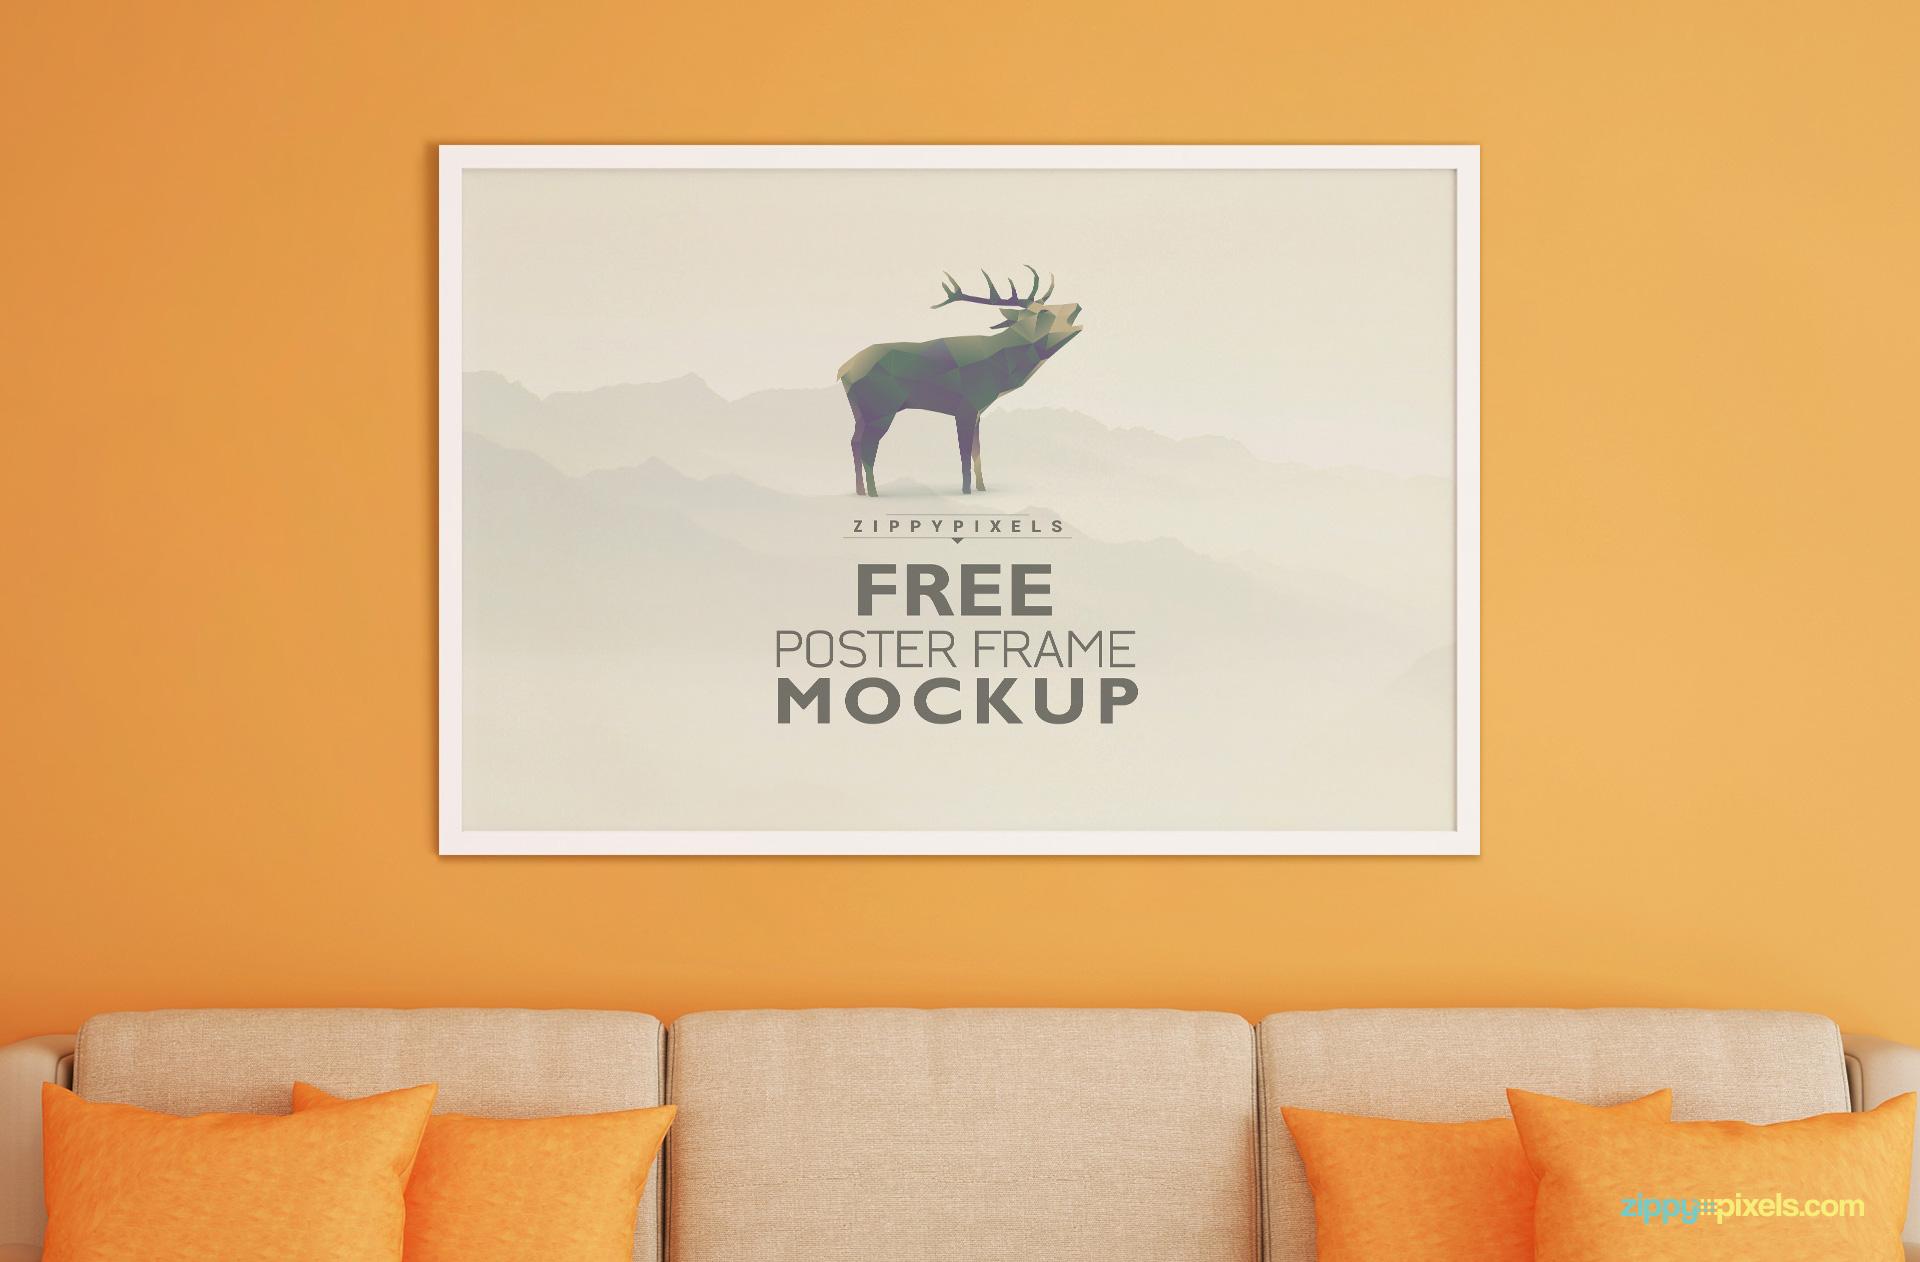 Free Frame Mockup for Poster, Photo & Artwork